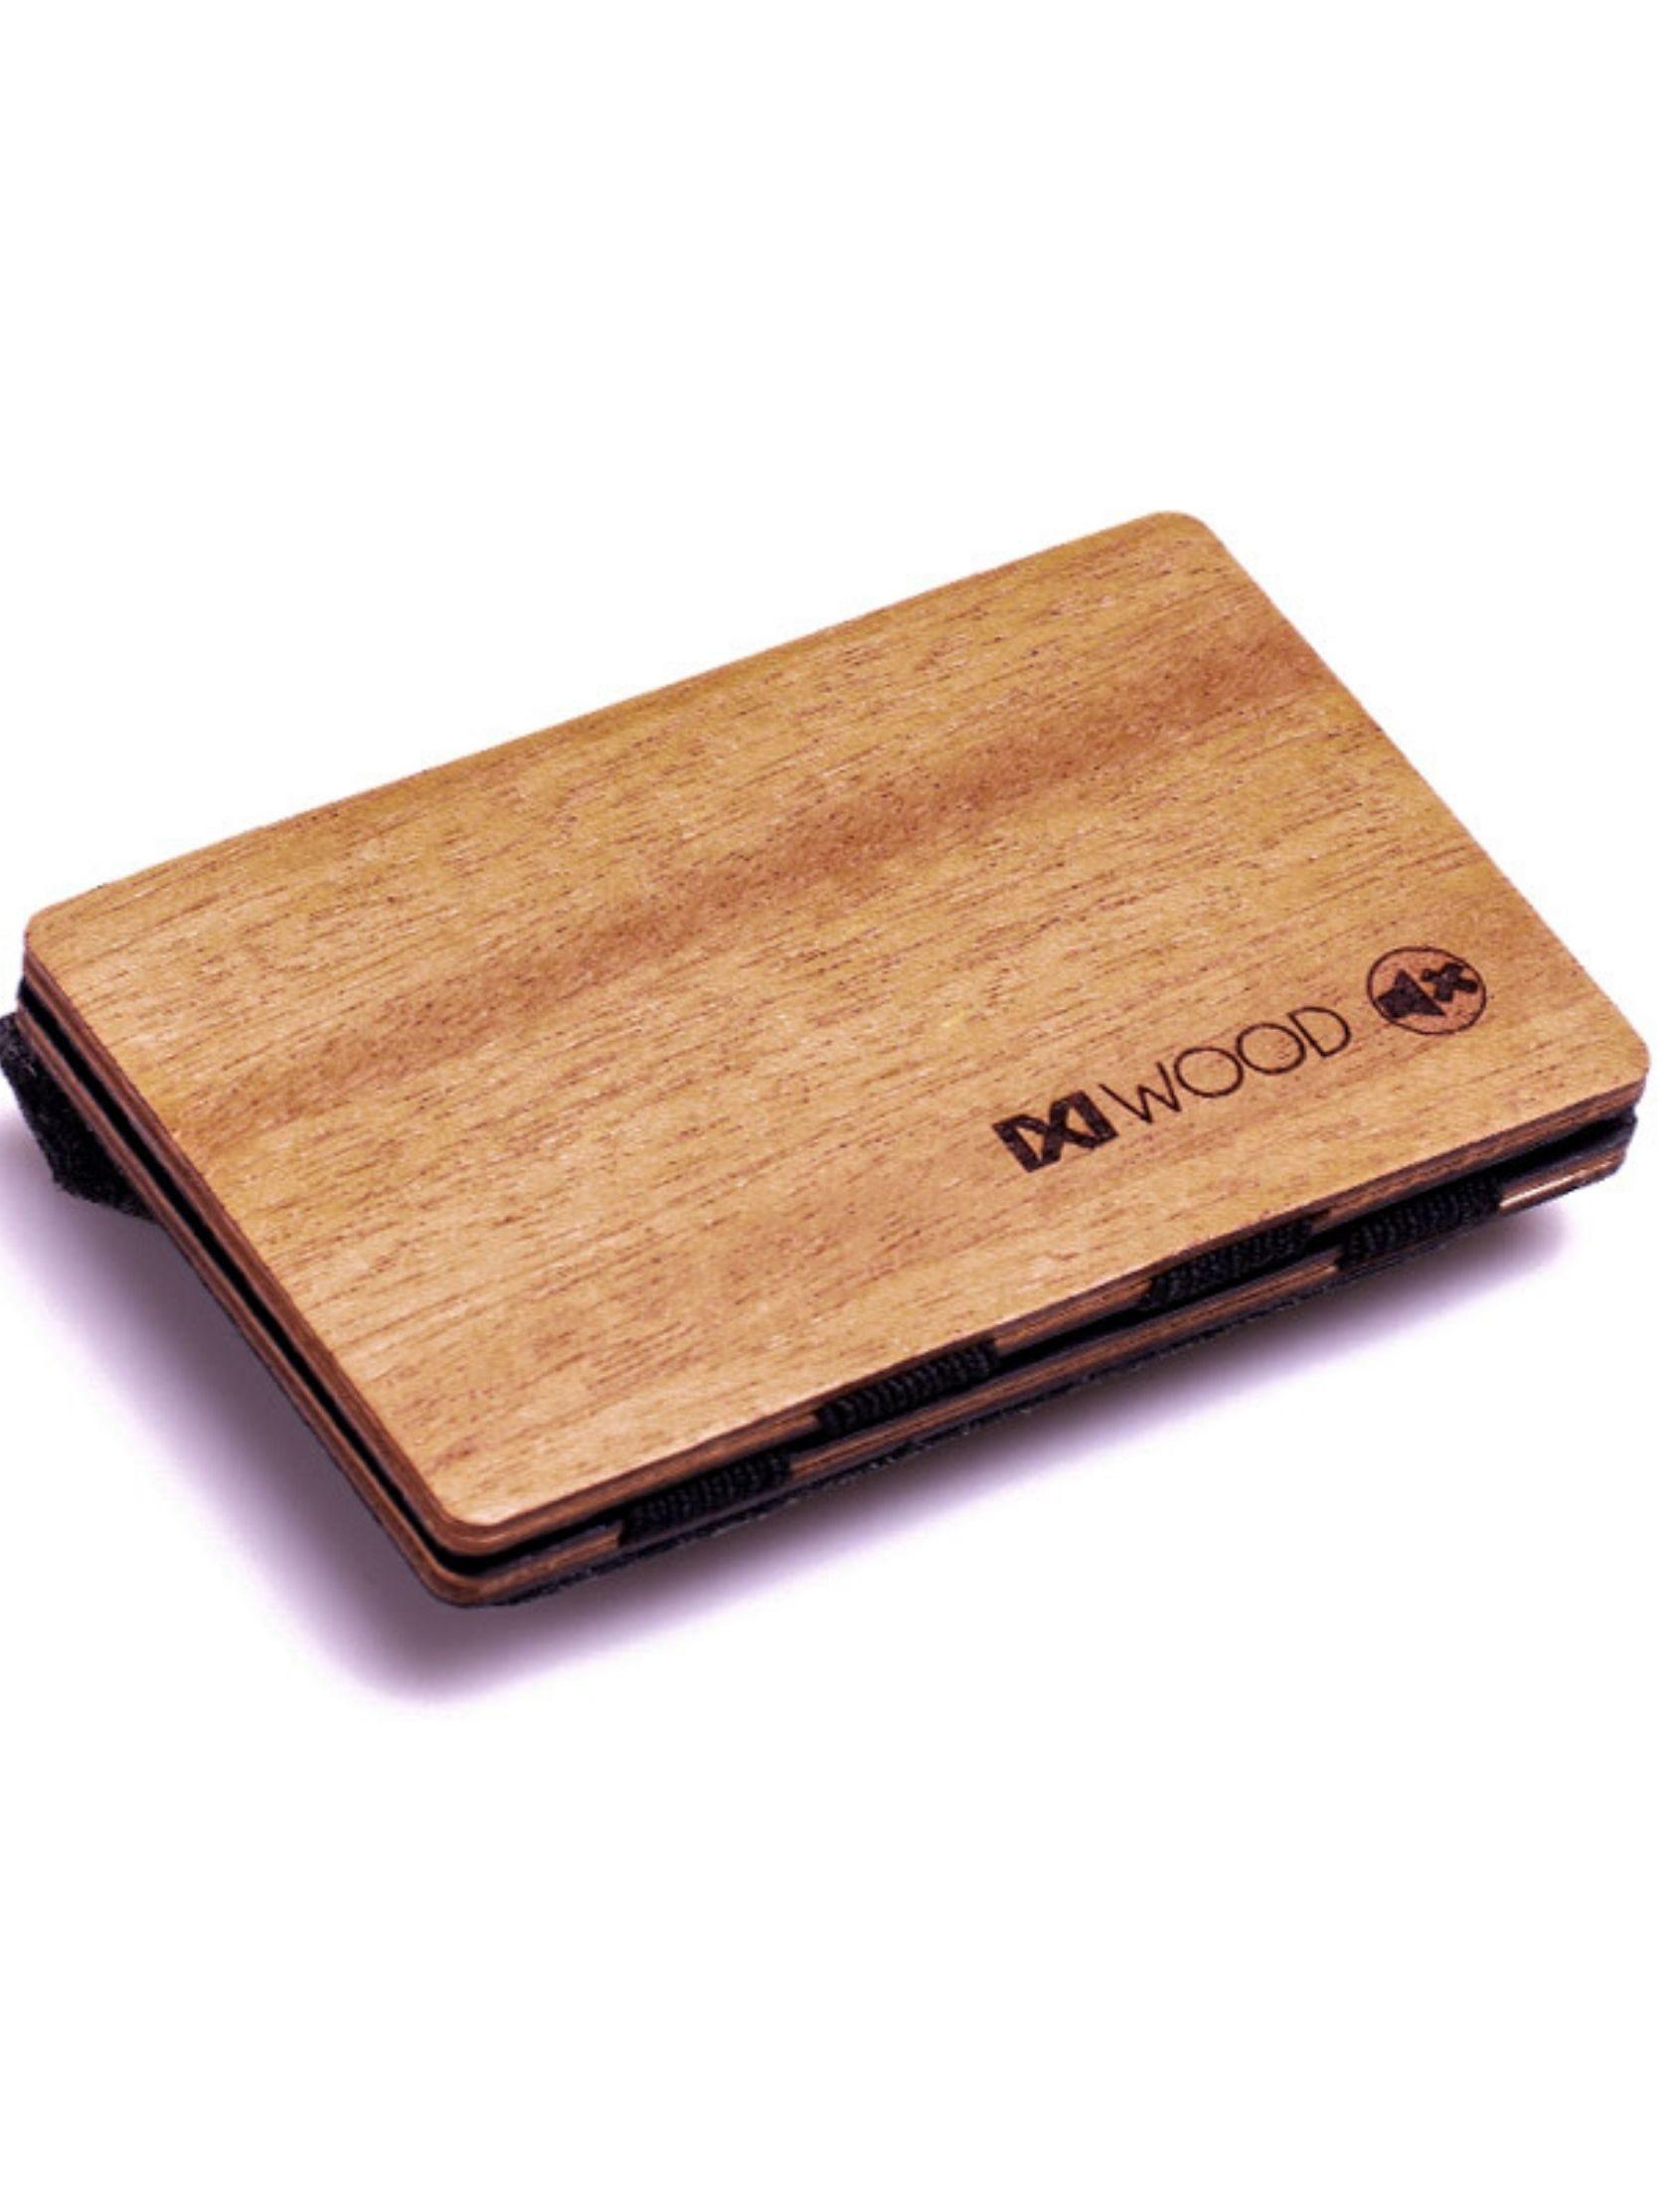 cartera iroko de madera con monedero de piñatex de ixi wood